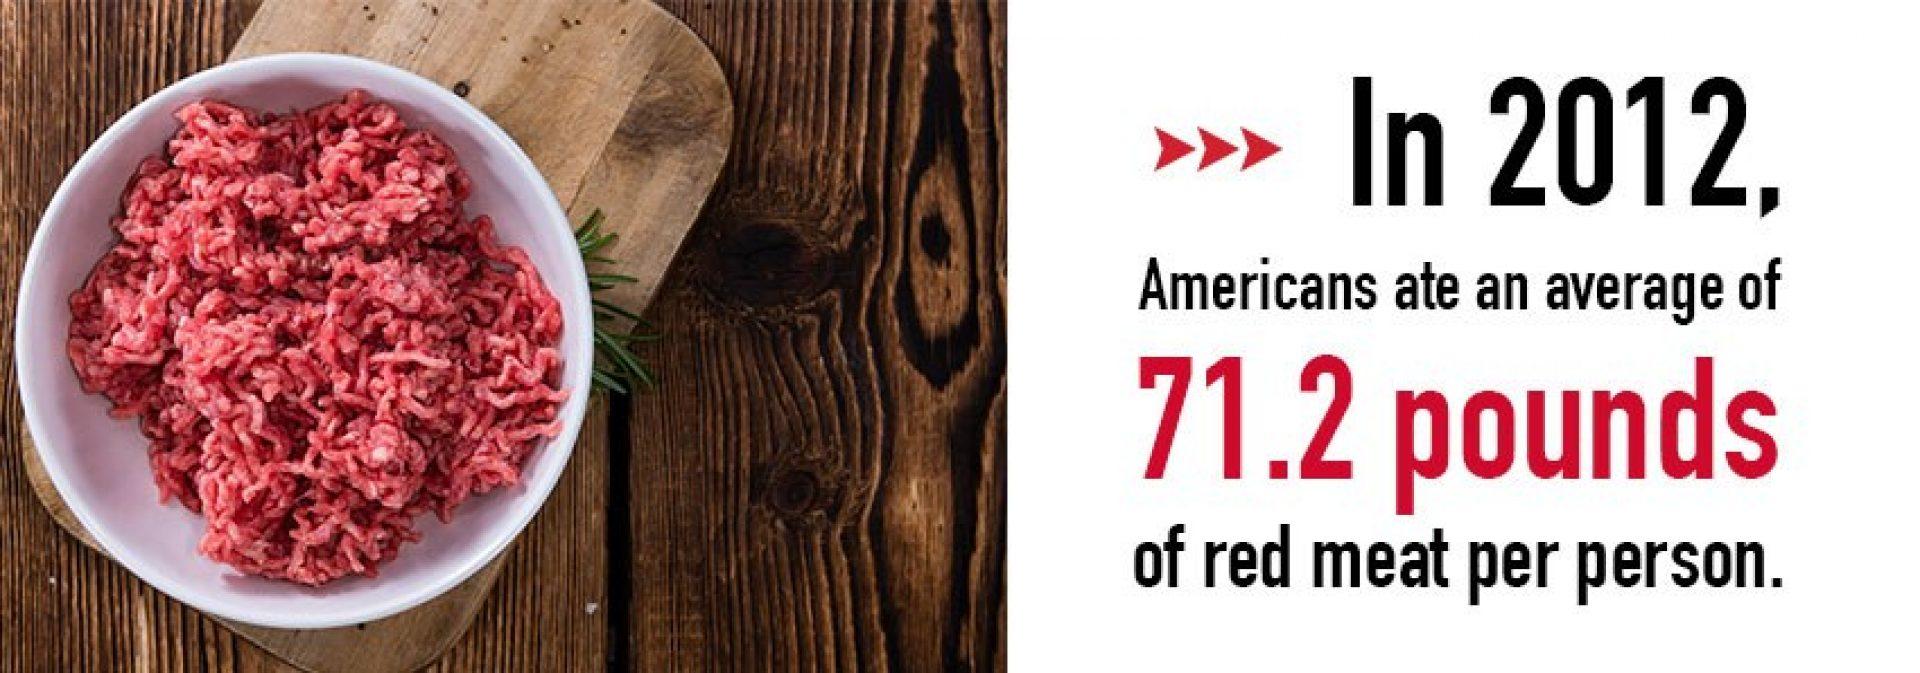 Beef Consumption | 2012